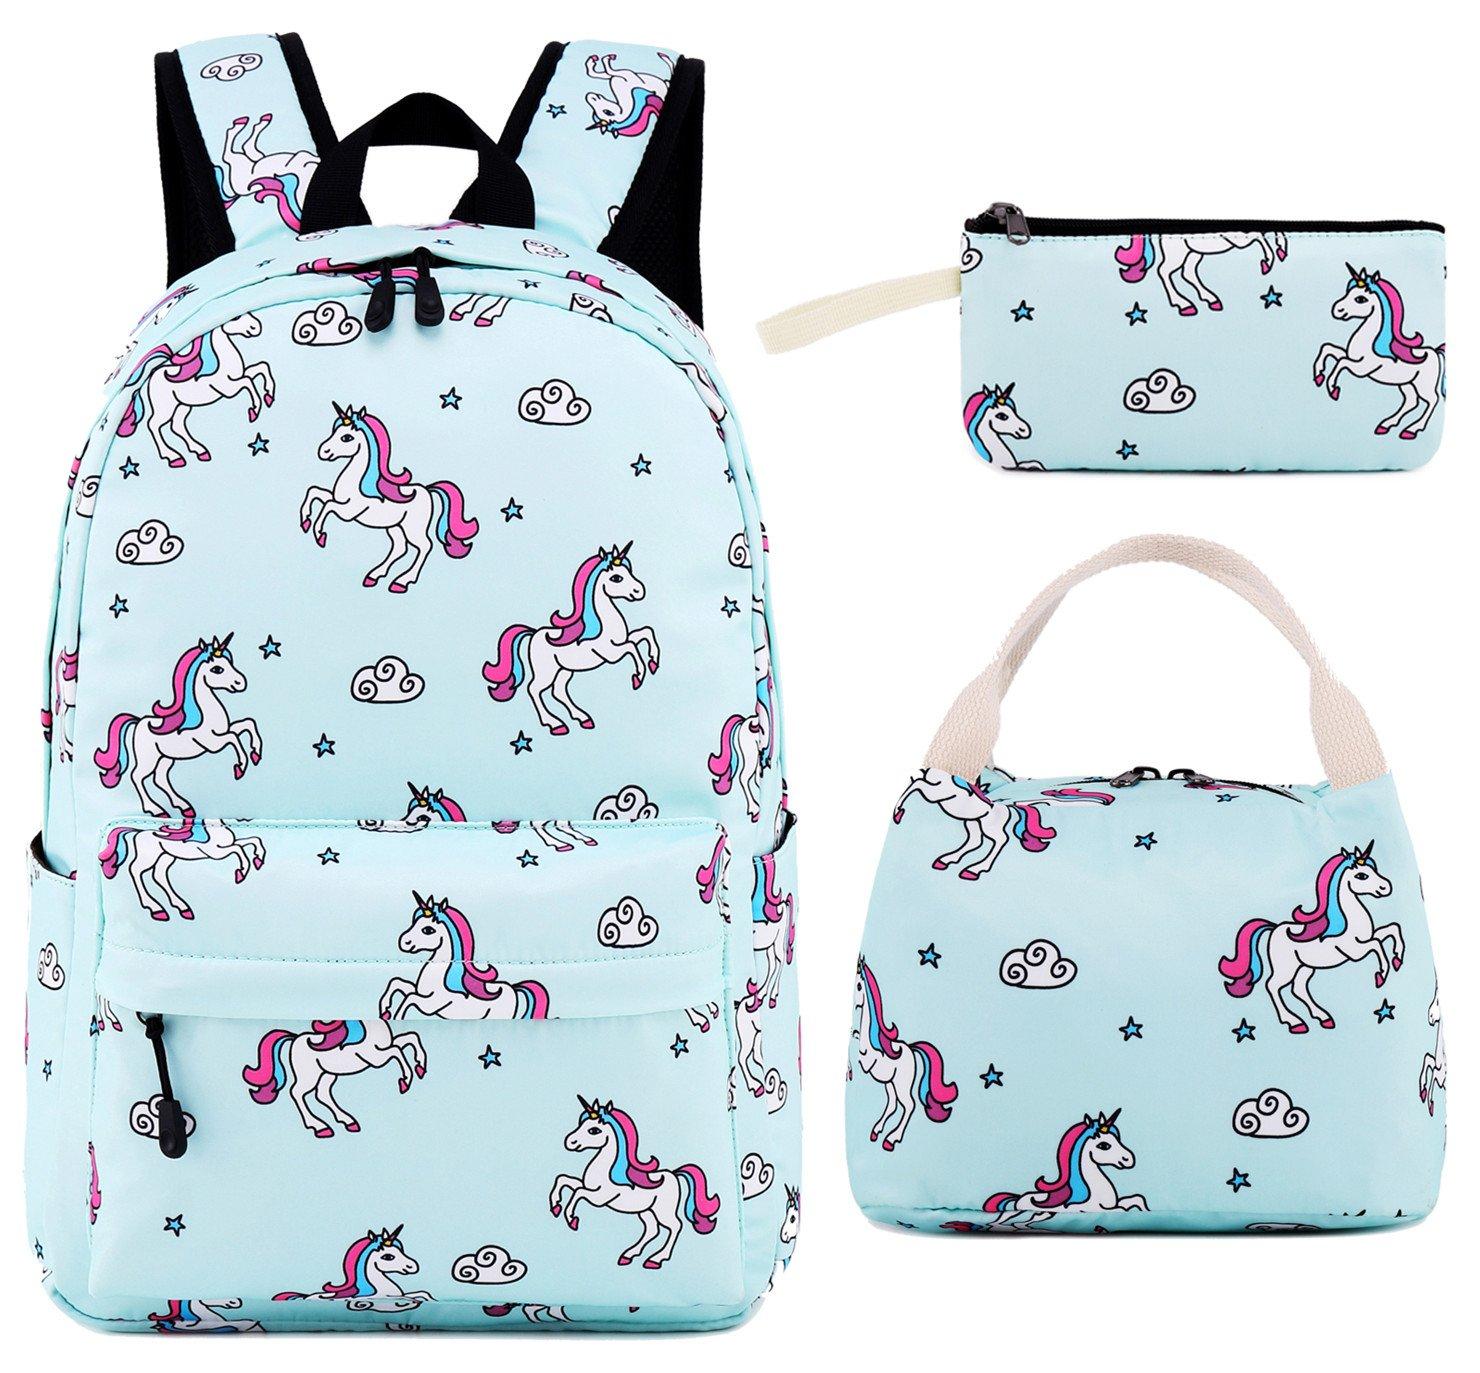 CAMTOP School Backpack for Girls Teens Bookbag Cute School Bag Set Water Resistant Travel Daypack (Light Blue Unicorn)